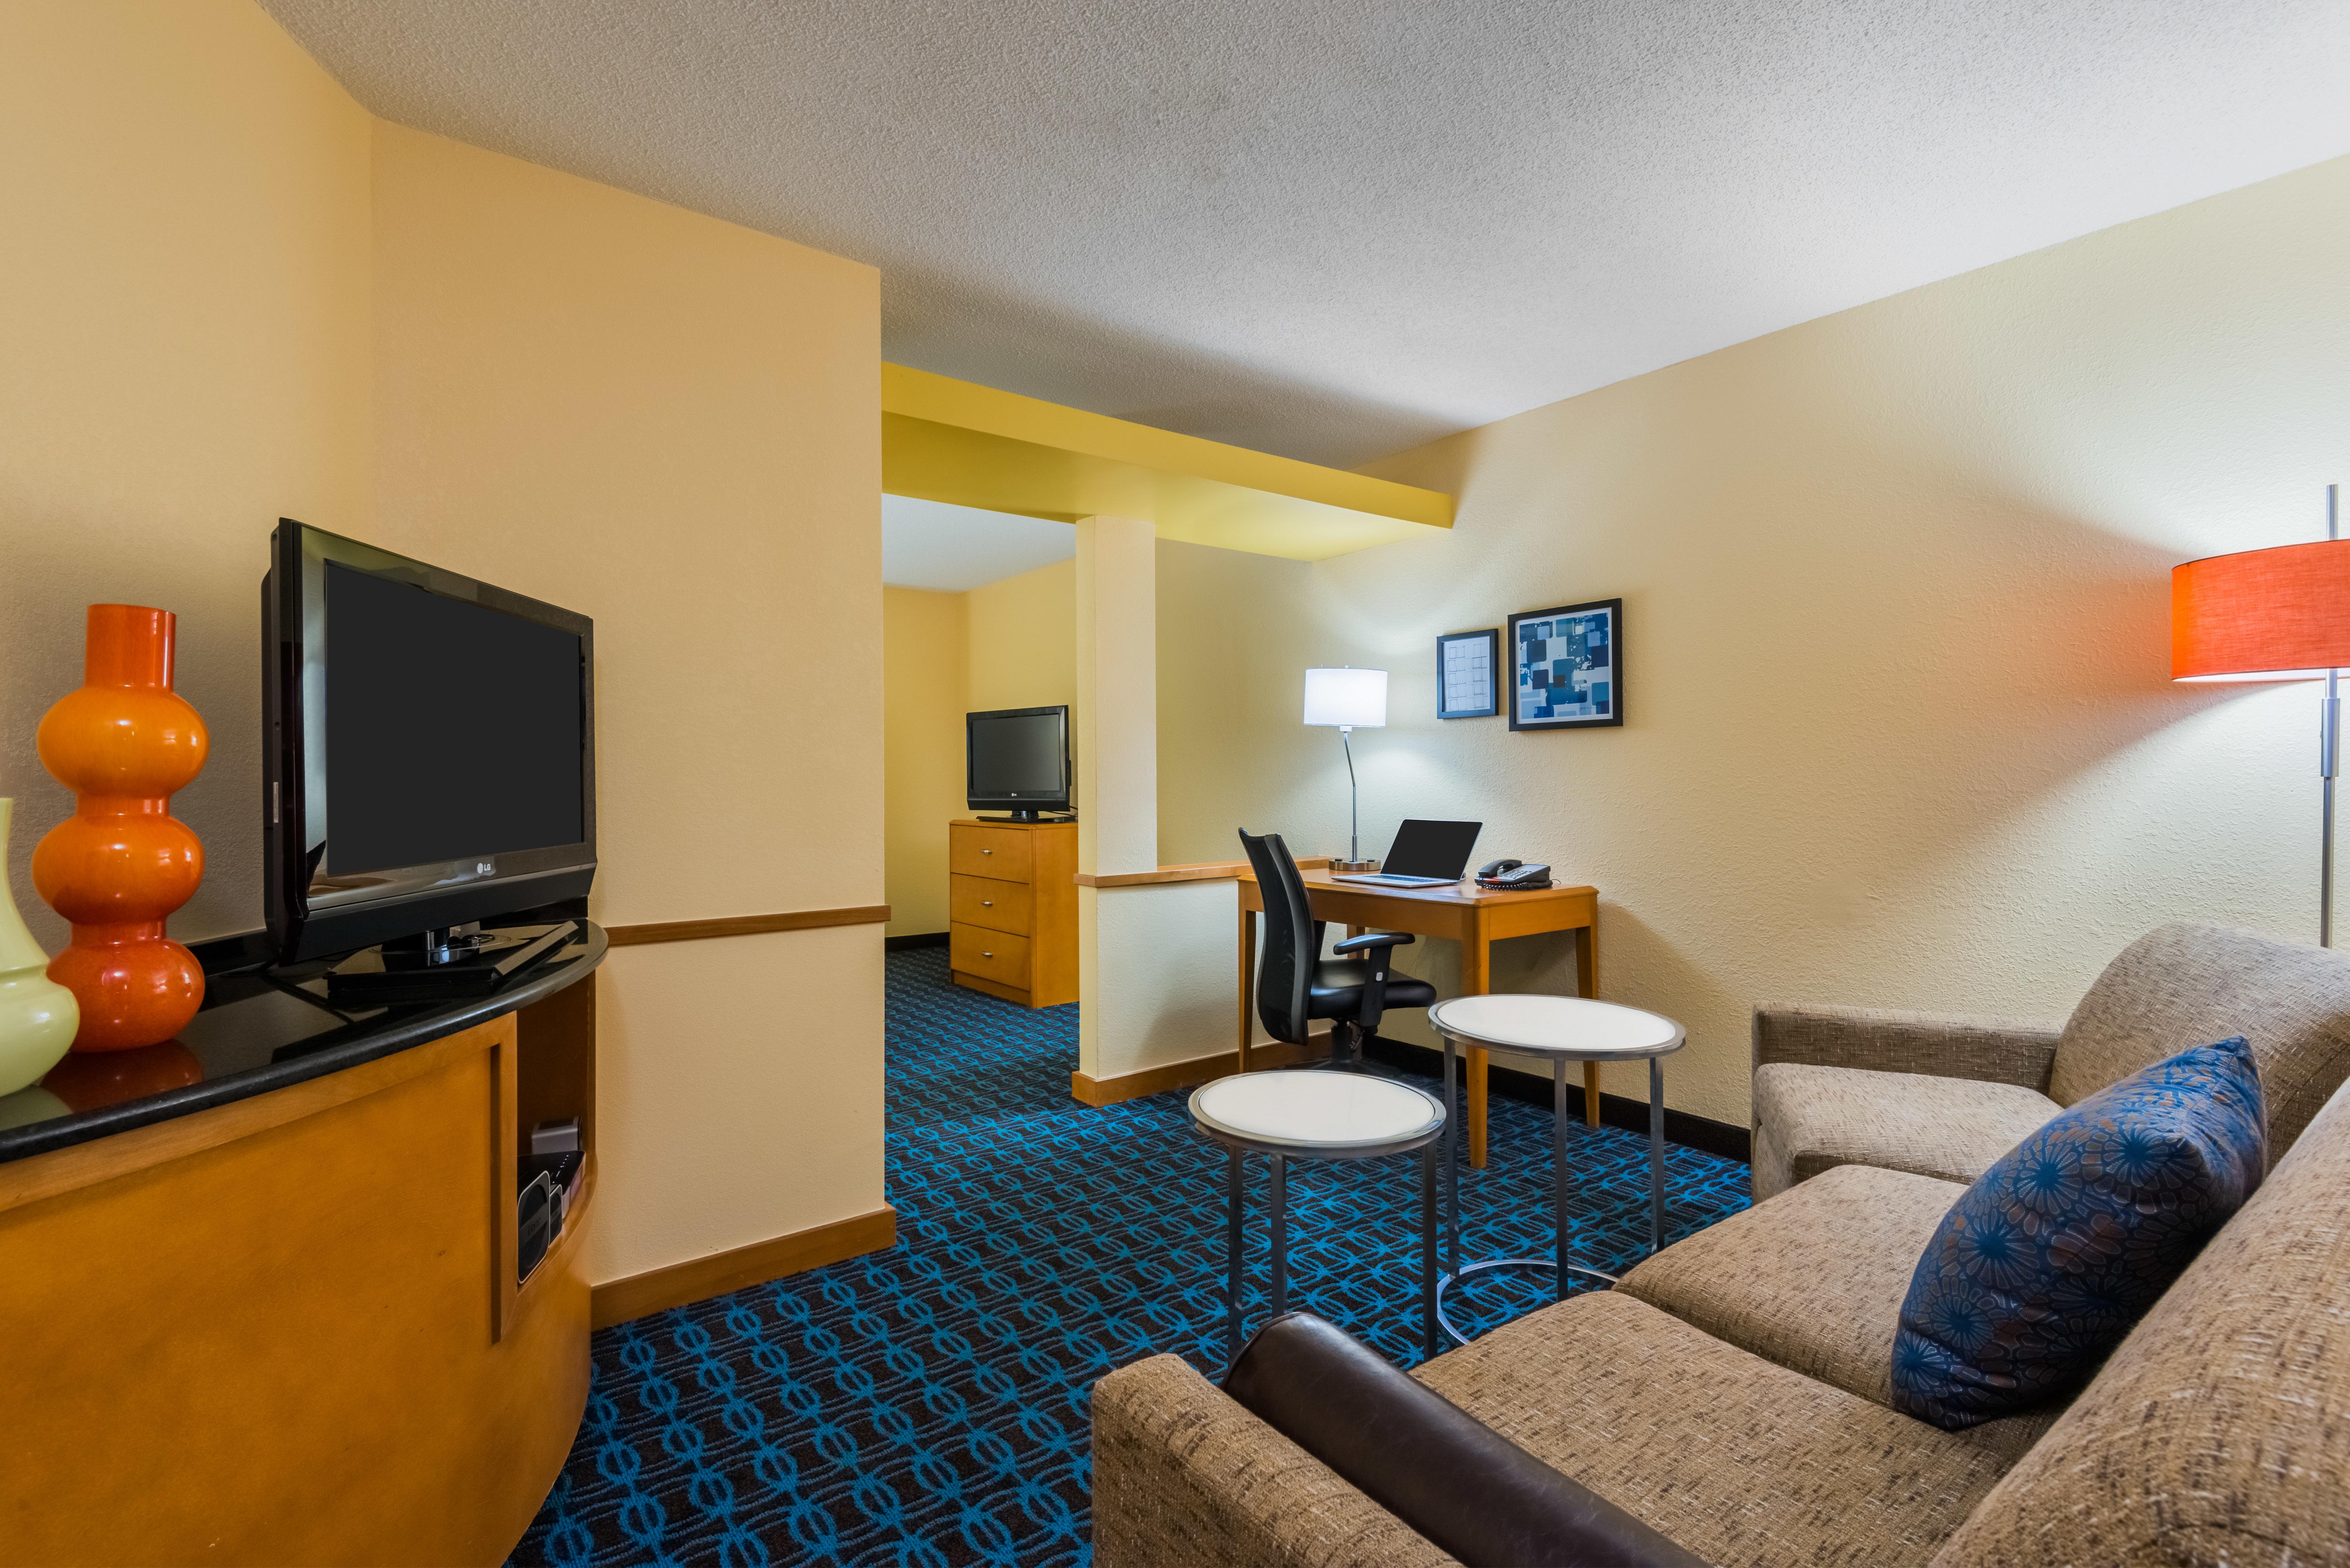 Fairfield Inn & Suites by Marriott Mobile image 9